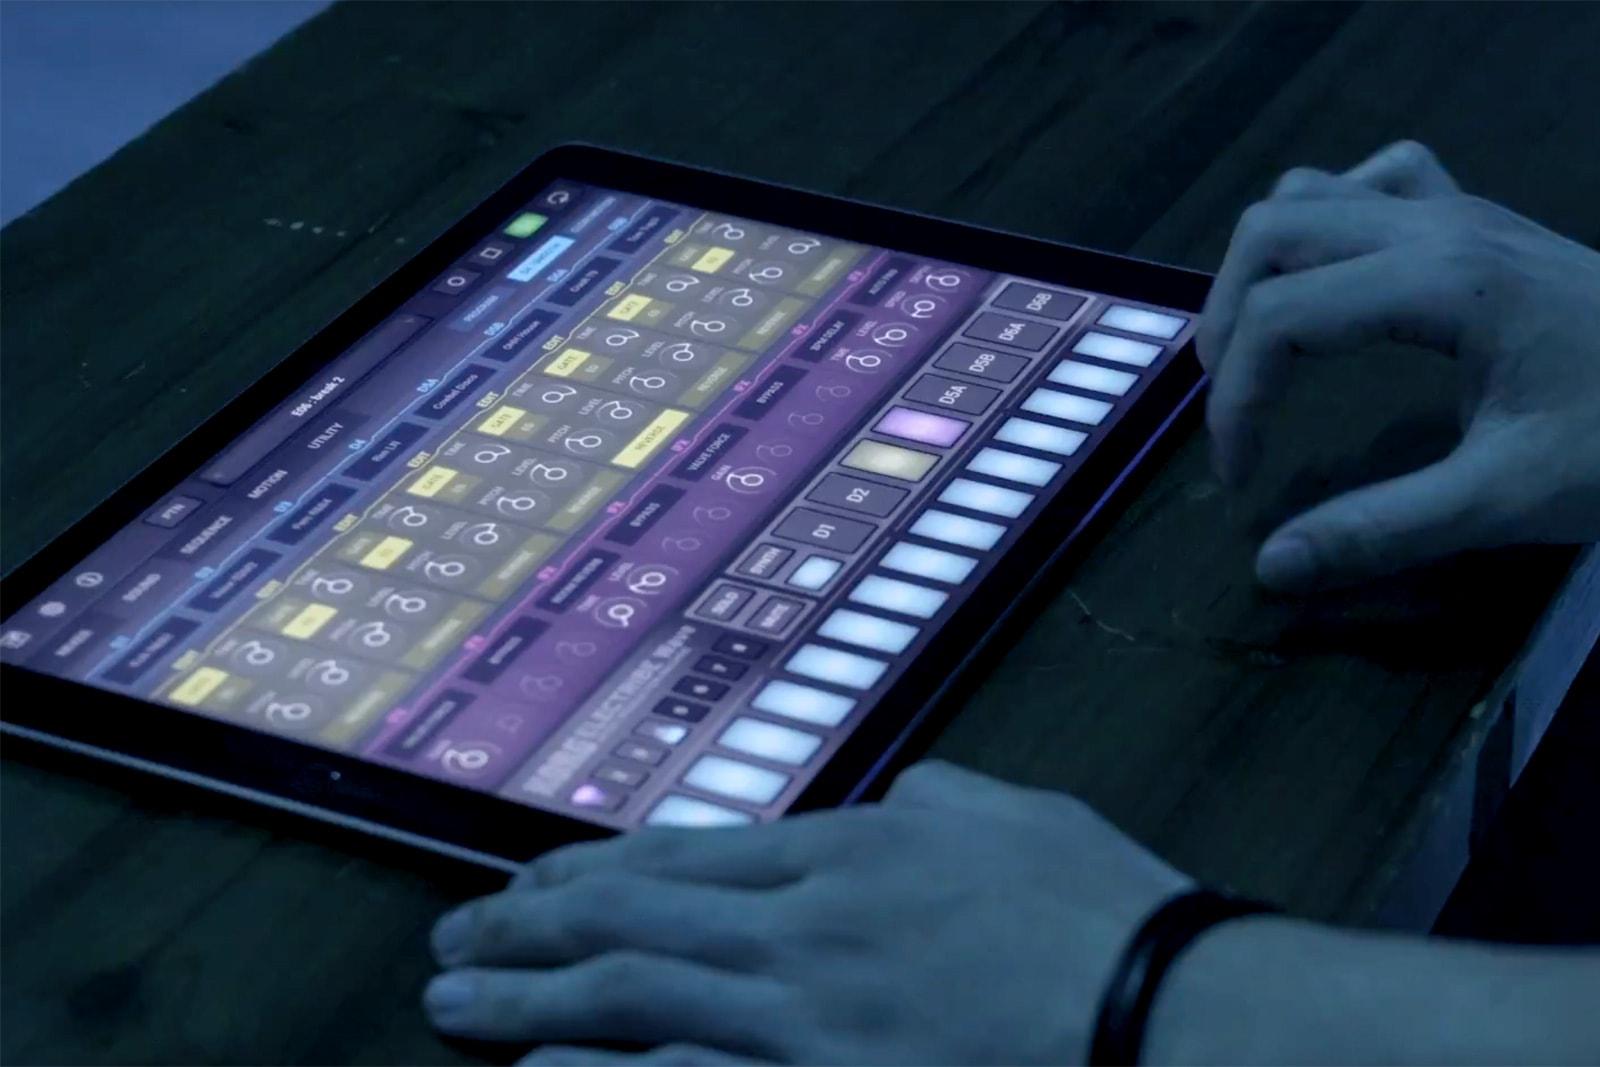 Korg S Electribe Wave App Turns An Ipad Into An Edm Beat